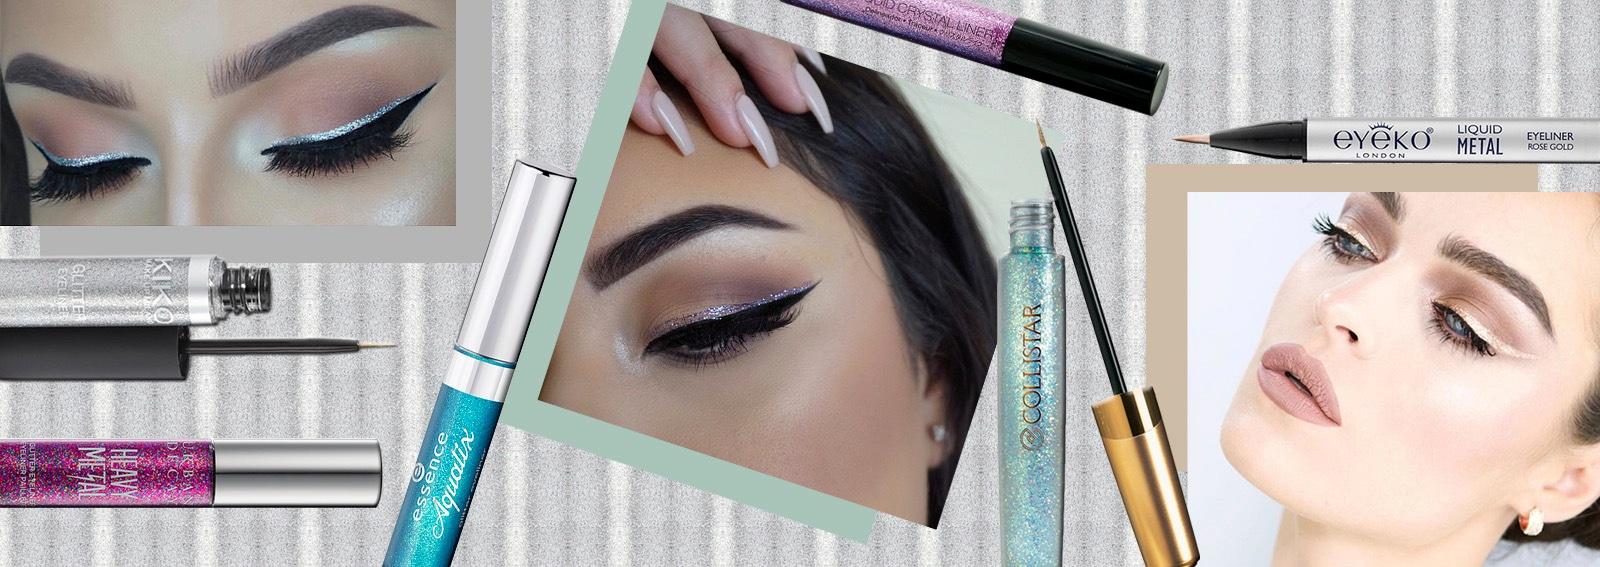 cover-trend-autunno-eyeliner-glitter-desktop